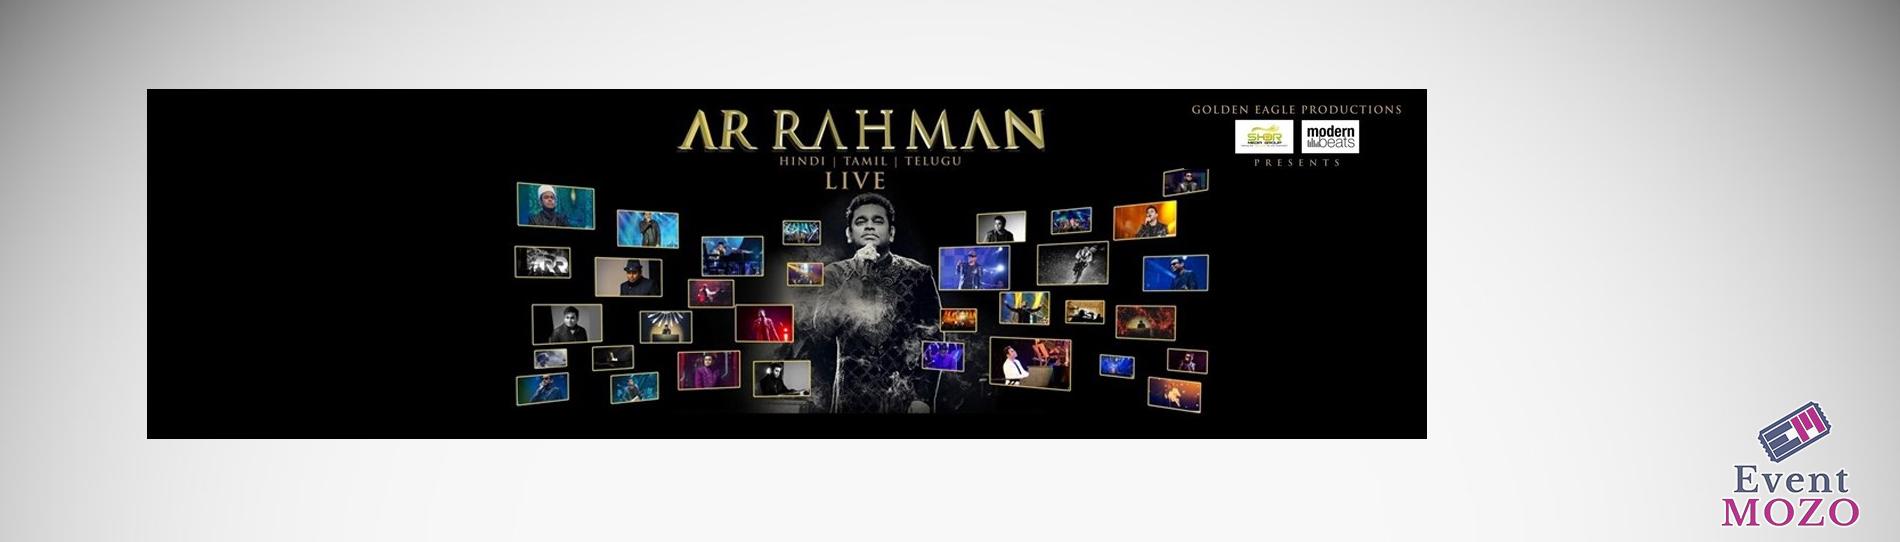 EventMozo AR Rahman and Troupe LIVE 2018 - 25 Glorious Years Of Musi....